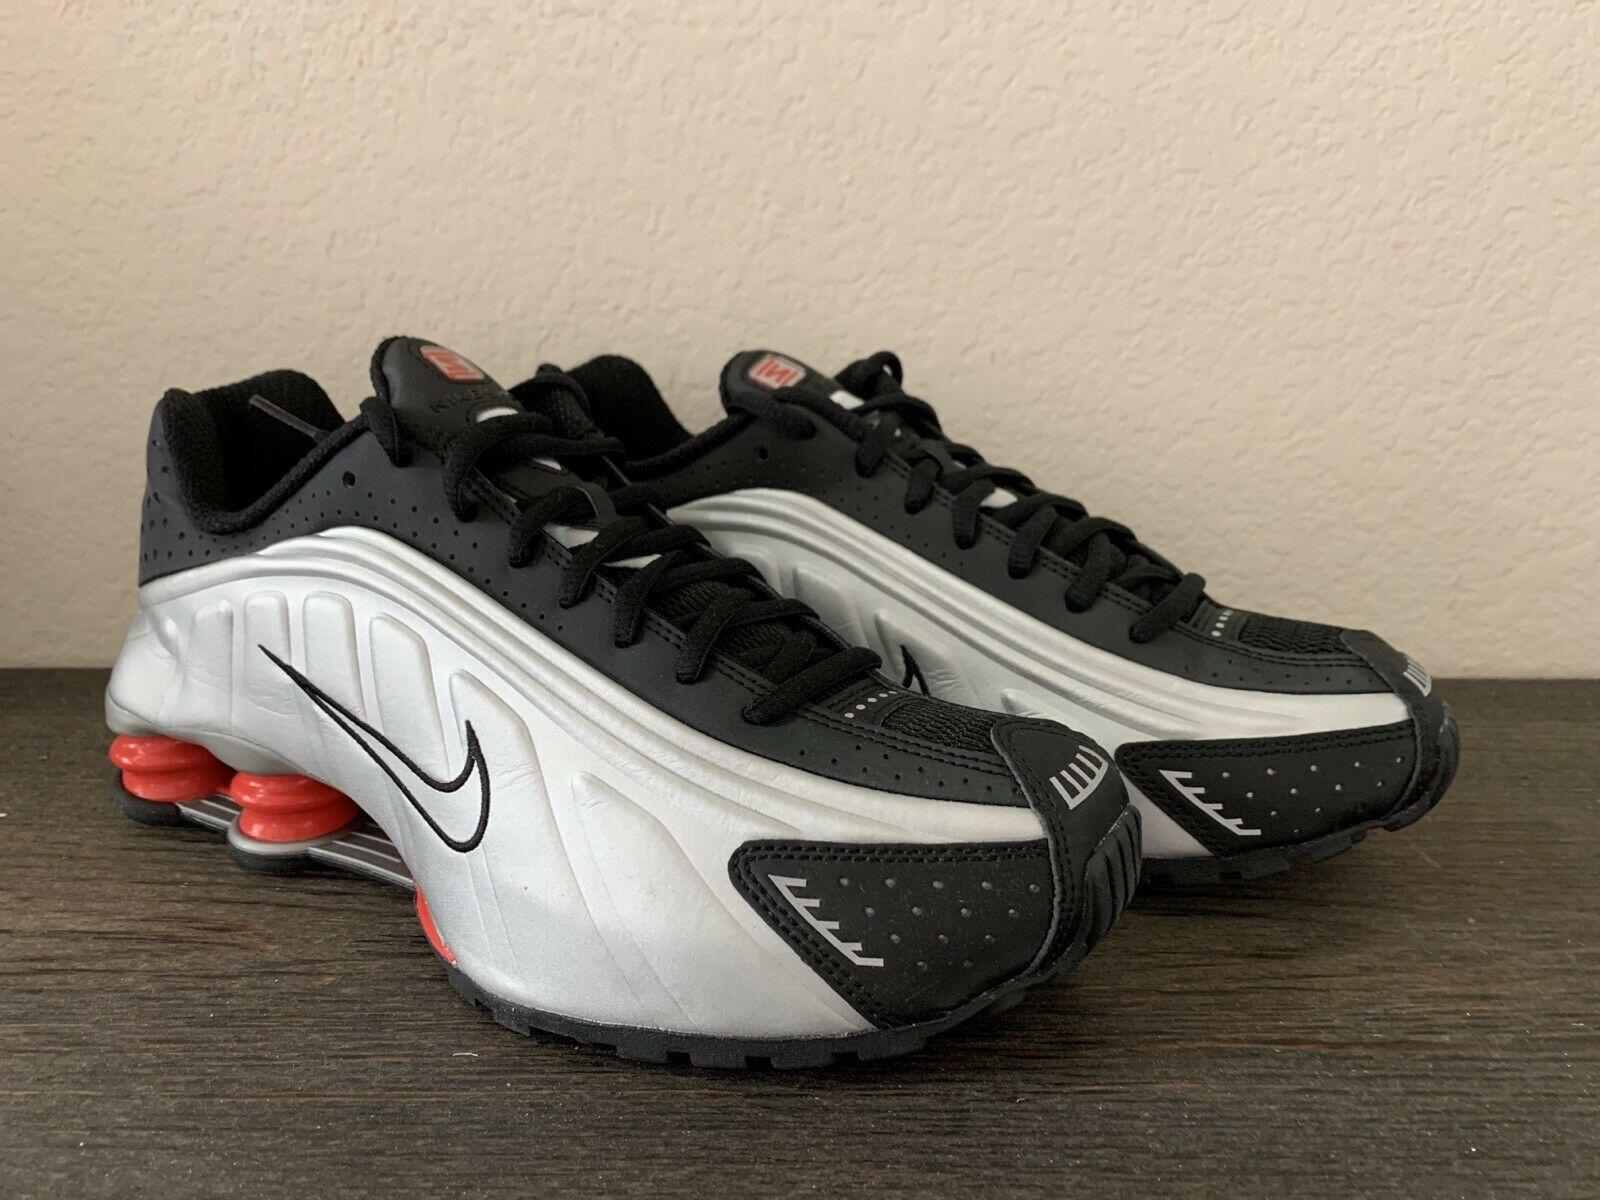 Nike Shox R4 Black Metallic Silver 2018